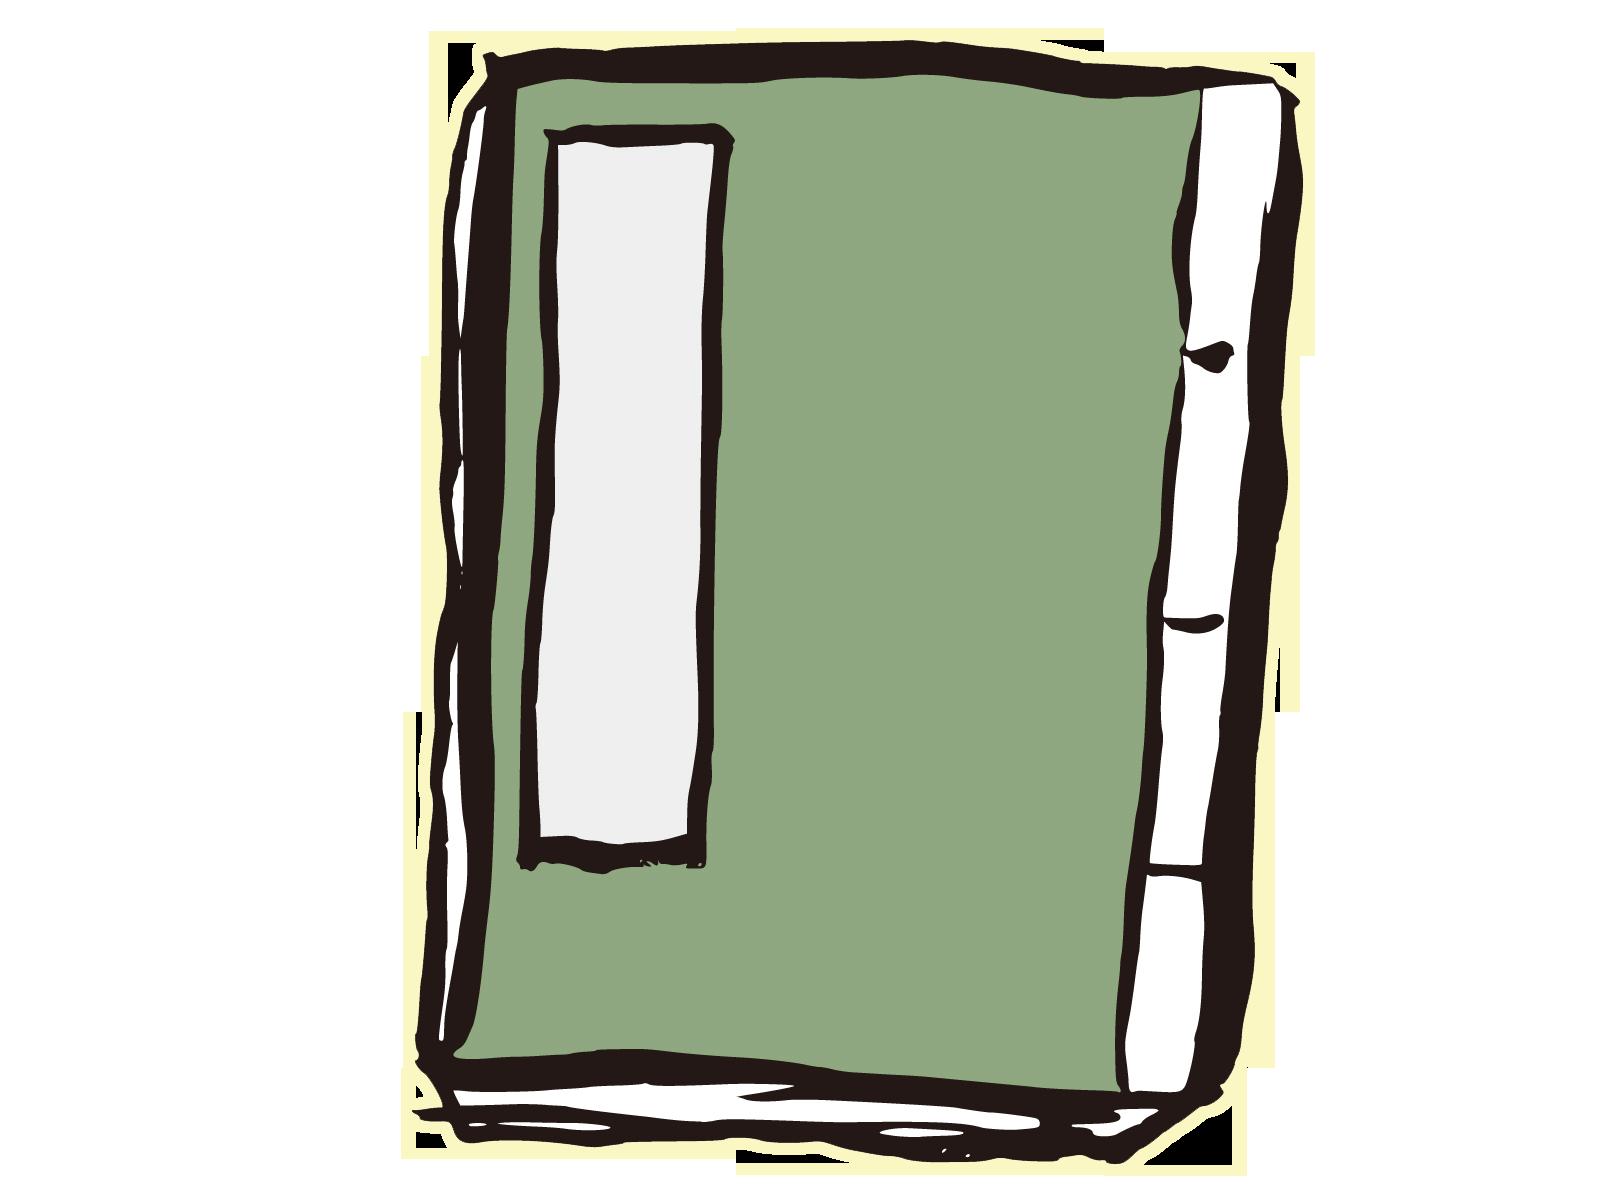 Bag clipart rectangle Bag Clip Art Download to